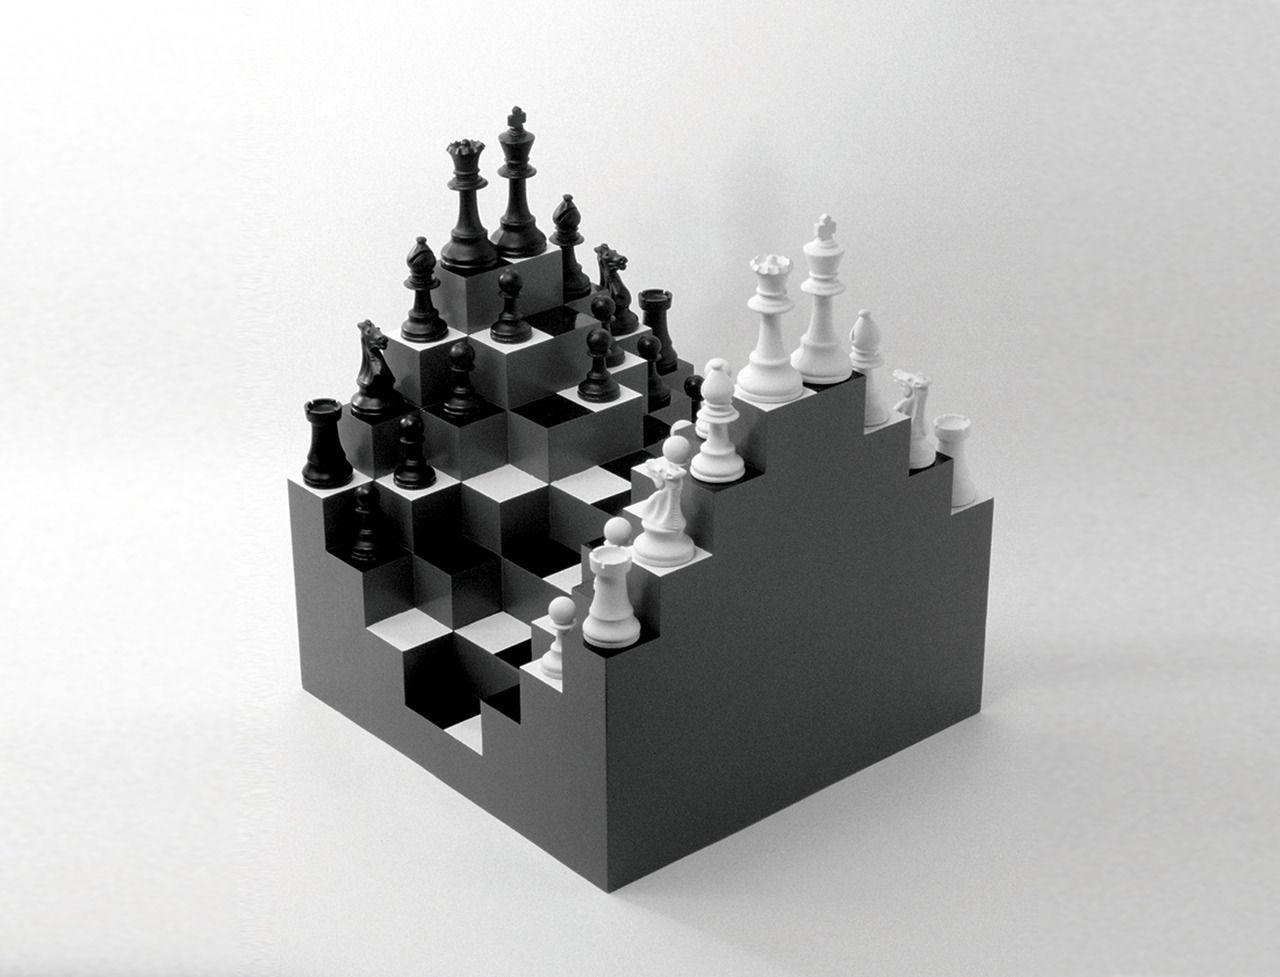 It S Not Quite Star Trek Tng S 3d Chess But Ji Lee S Board